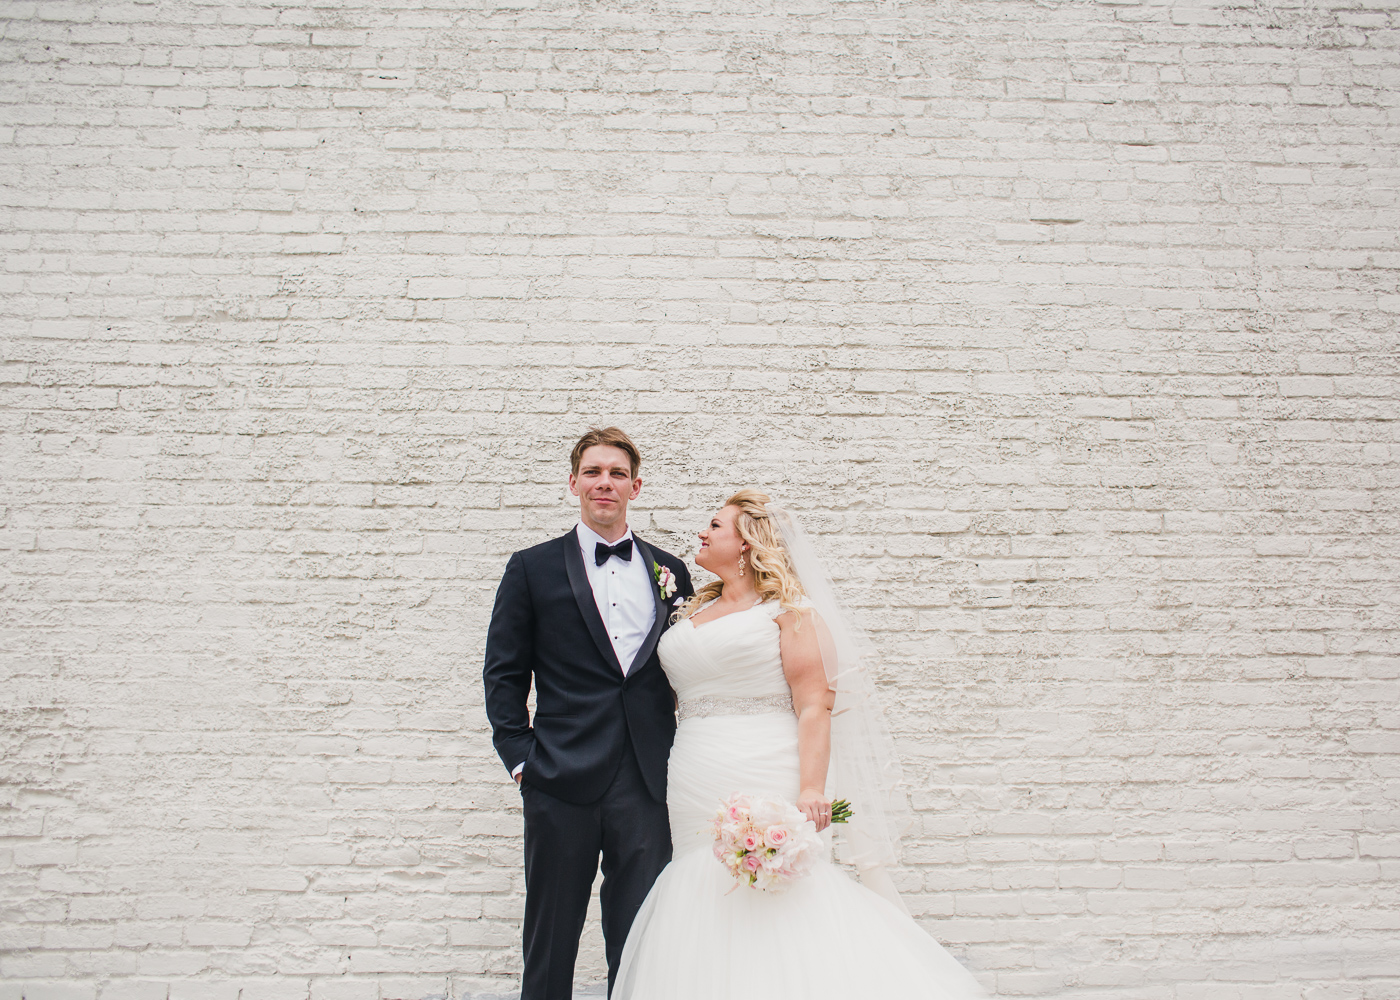 EMILY & ERIK // WEDDING